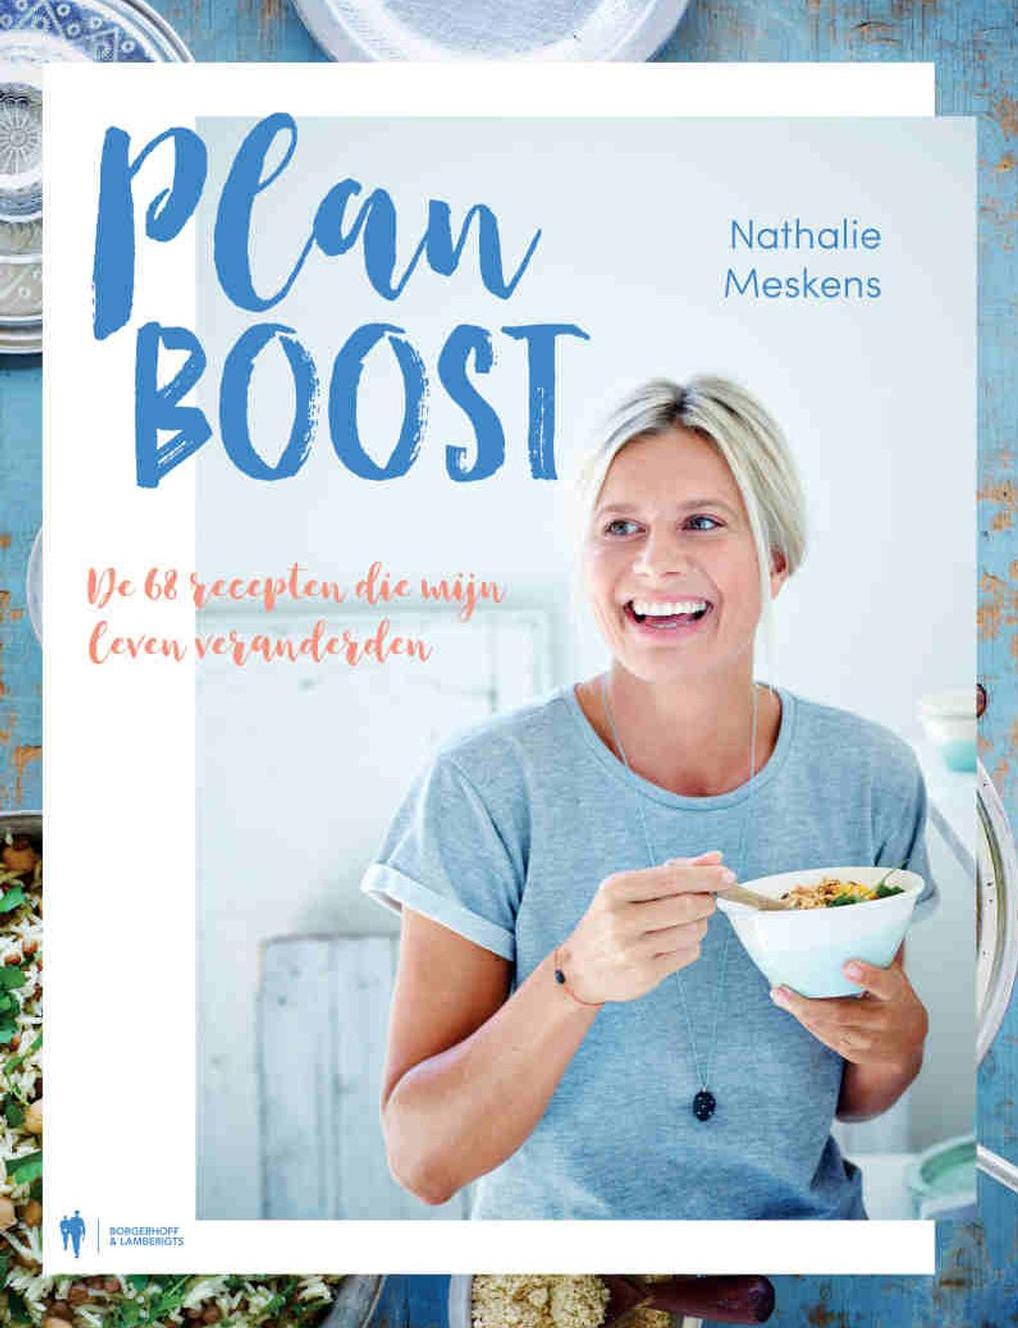 Nathalie-mesk-plan-boost-cover.jpg